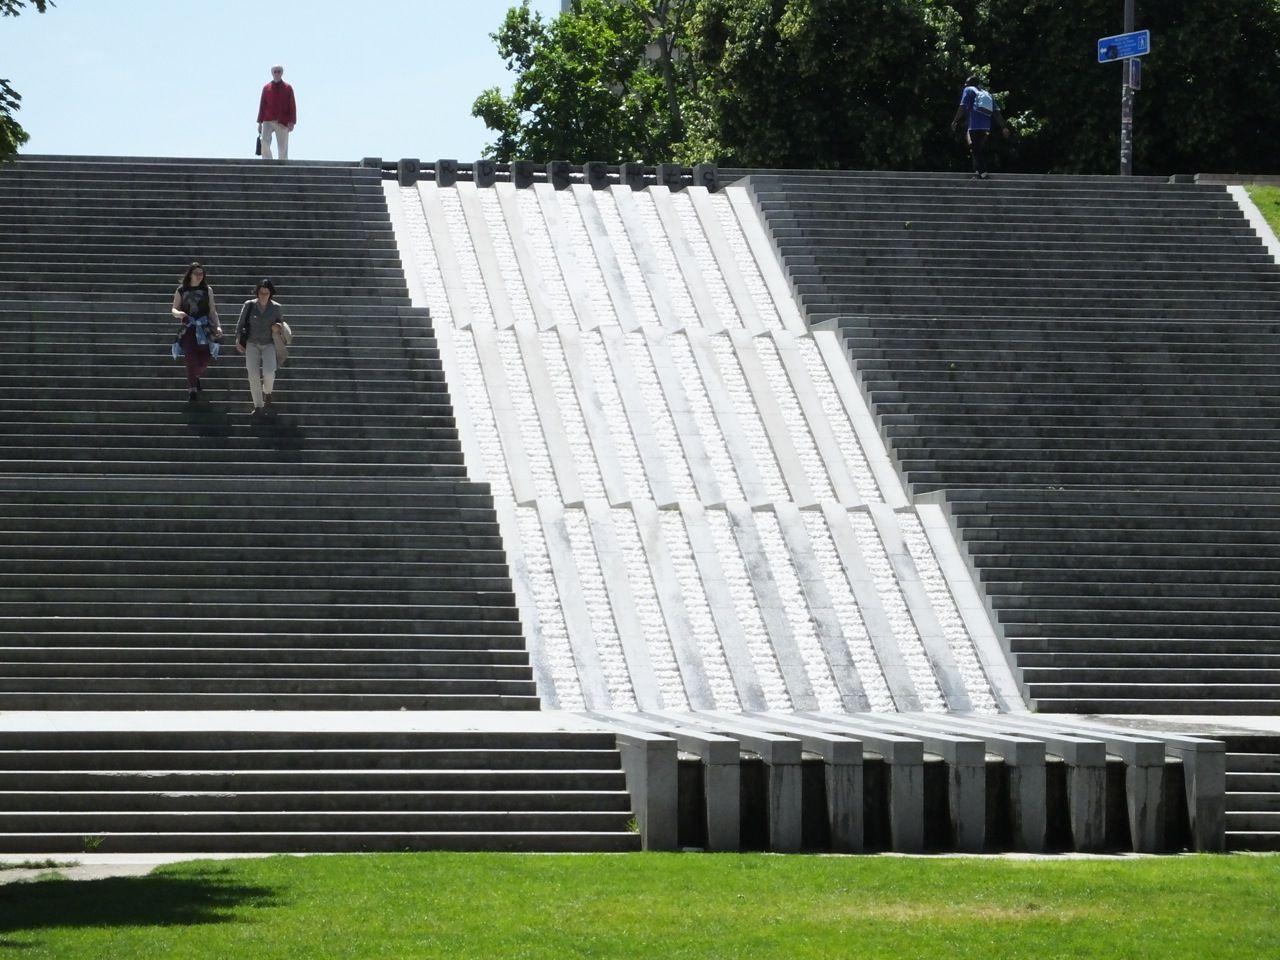 Water steps at Parc de Bercy